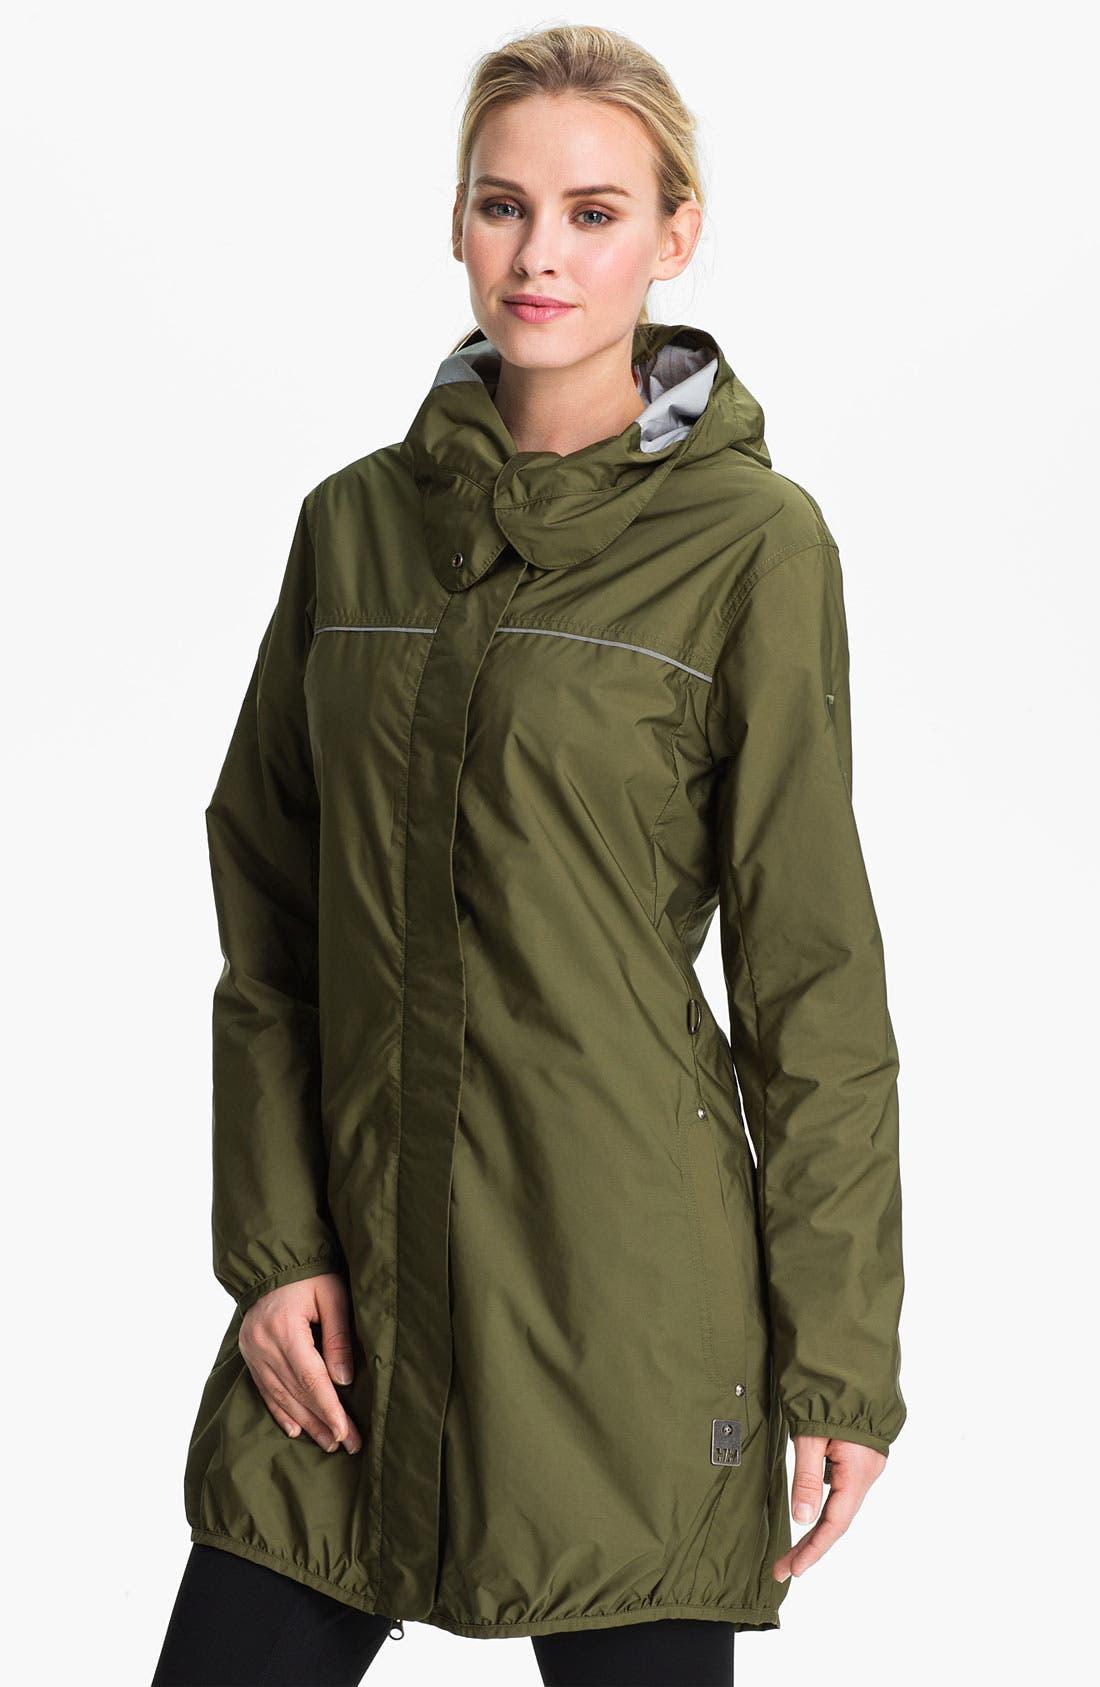 Main Image - Helly Hansen 'Embla' Weather Jacket